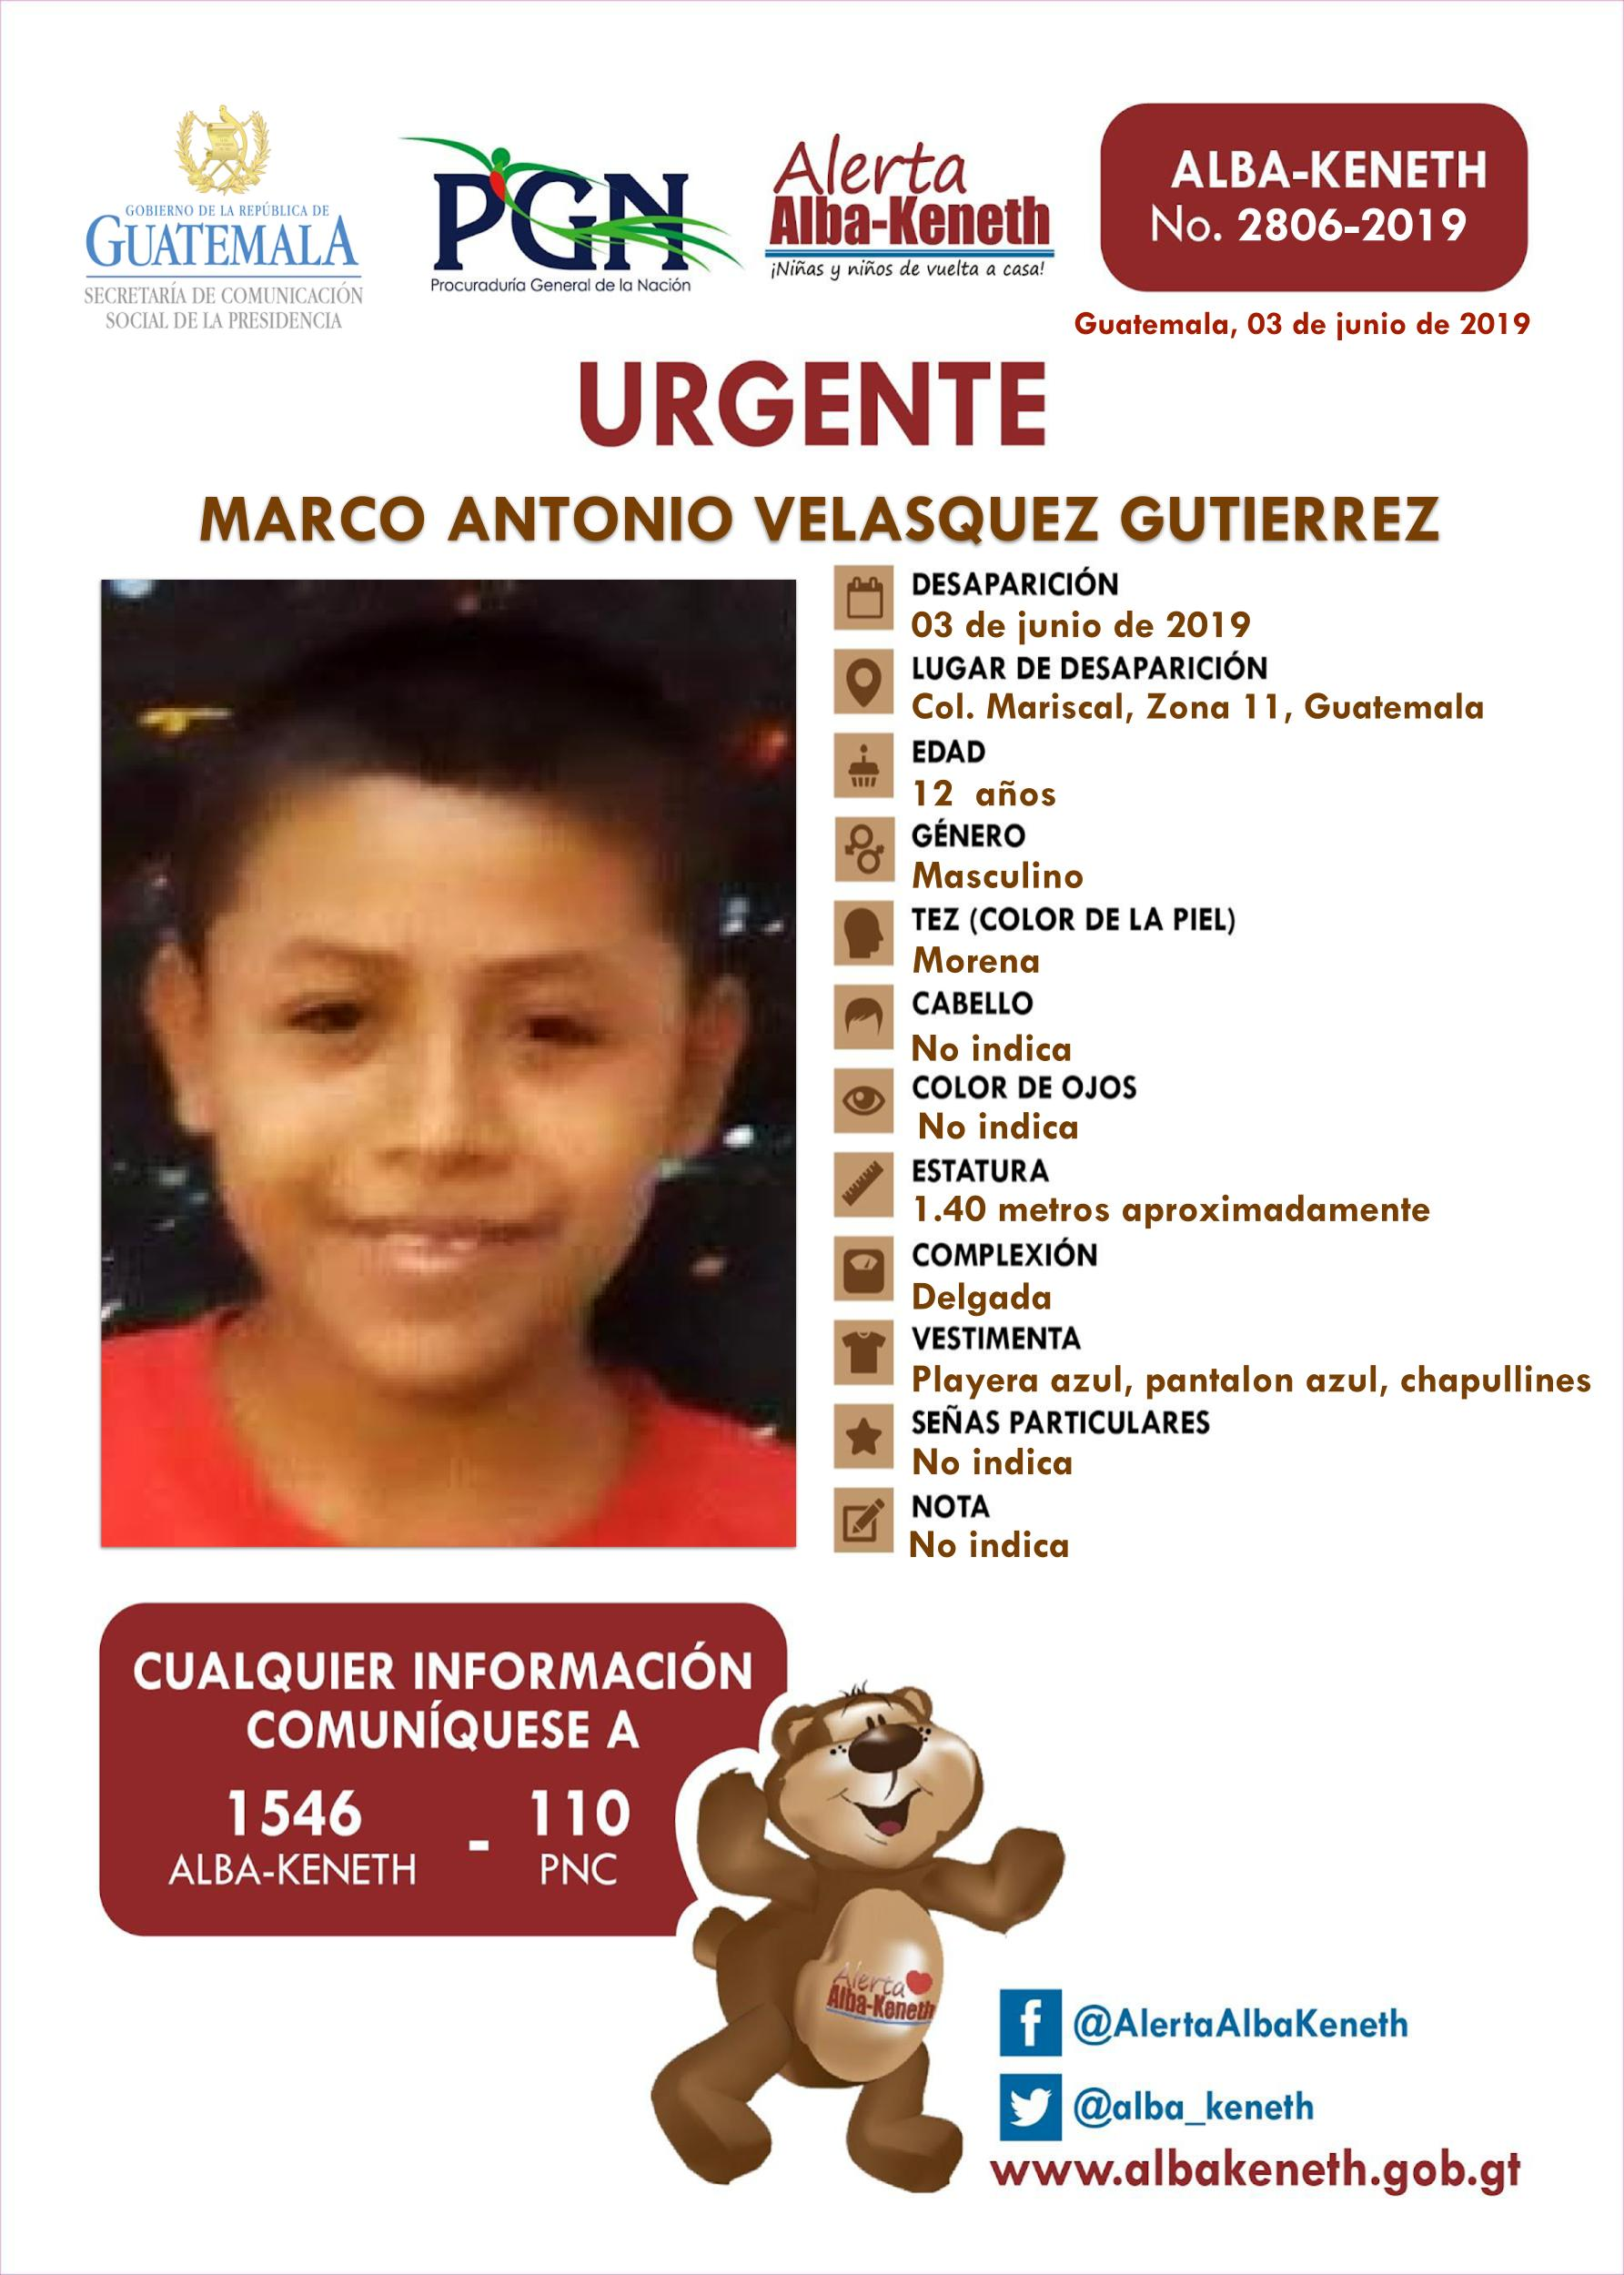 Marco Antonio Velasquez Gutierrez